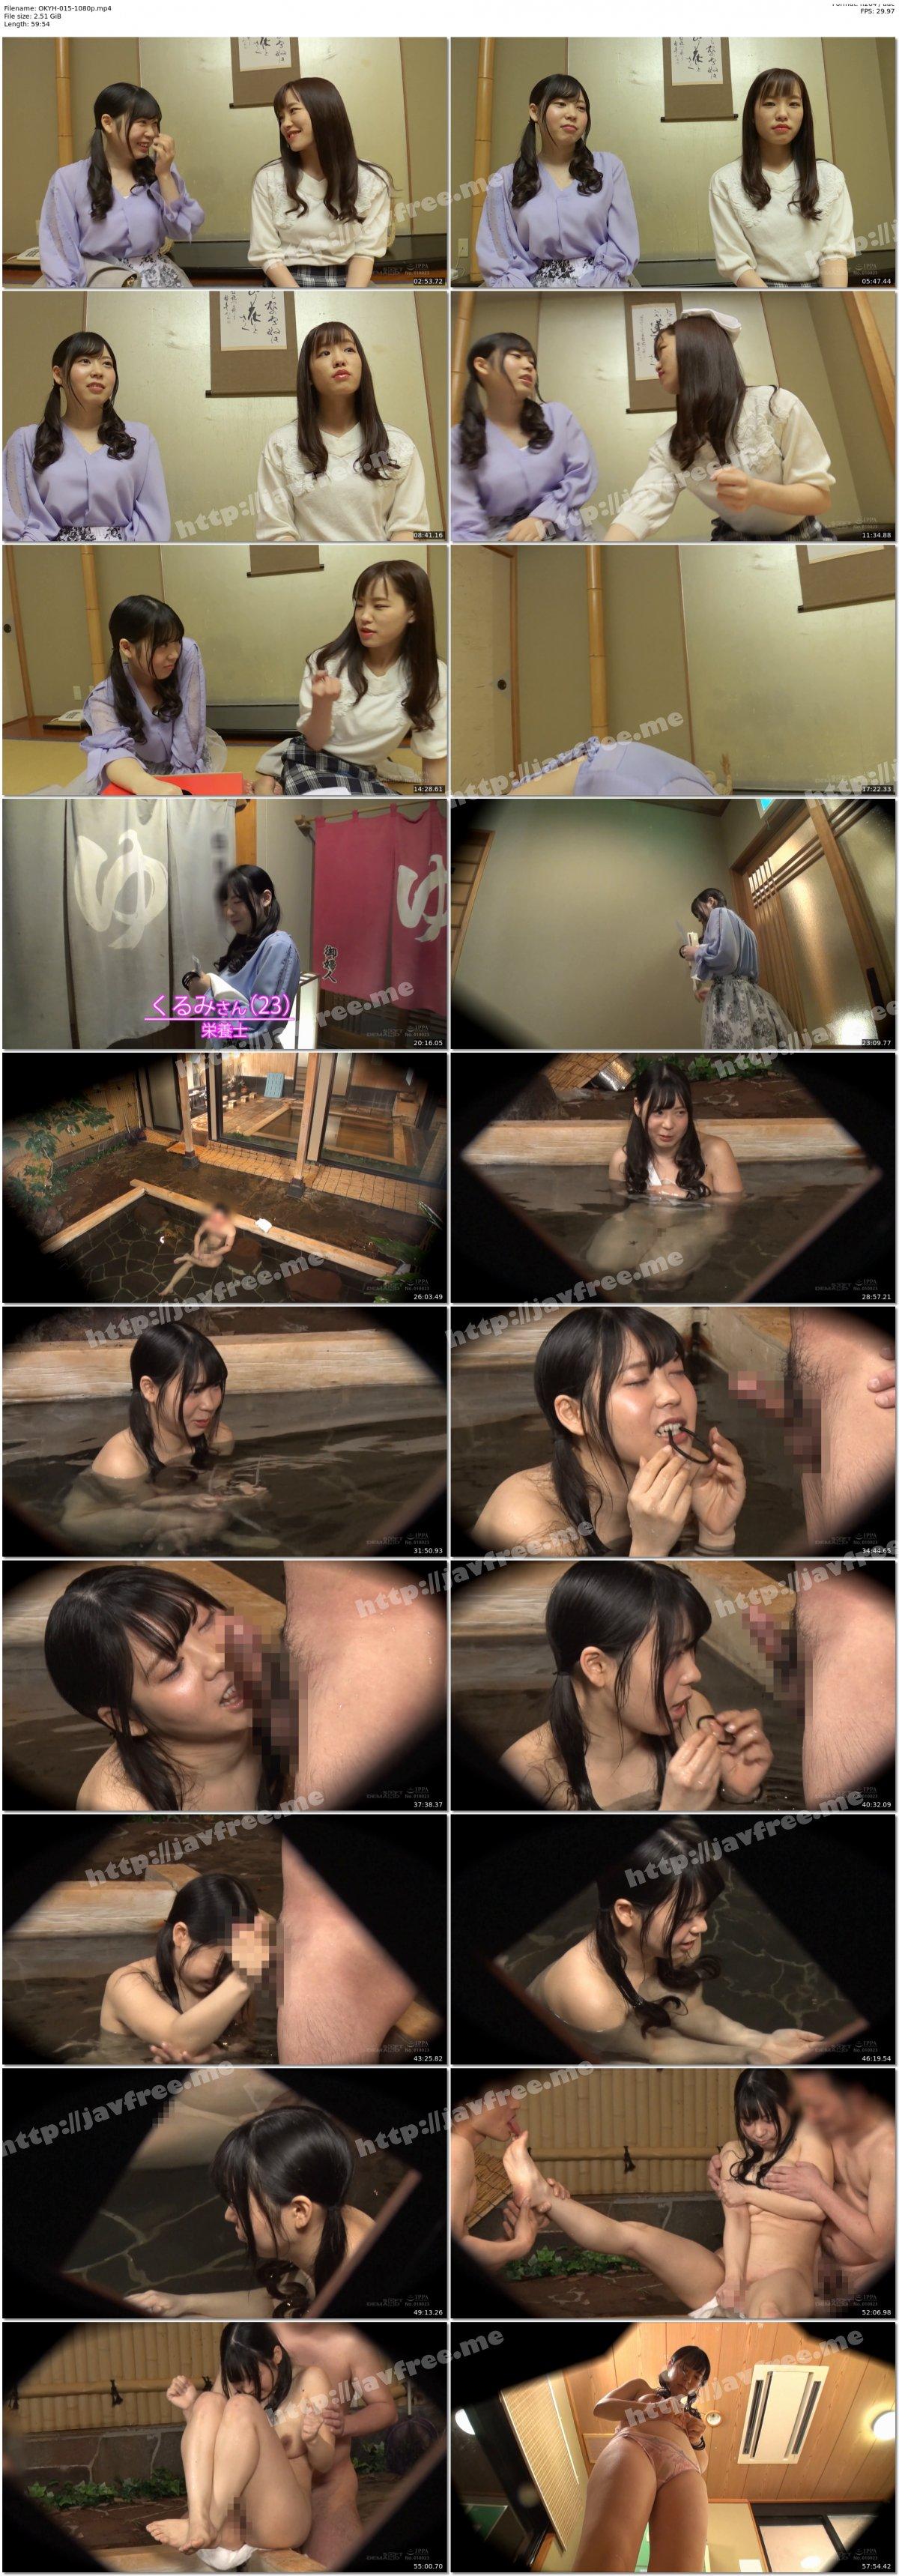 [HD][OKYH-015] くるみ(23)推定Hカップ 箱根湯本温泉で見つけたお嬢さん タオル一枚 男湯入ってみませんか? - image OKYH-015-1080p on https://javfree.me